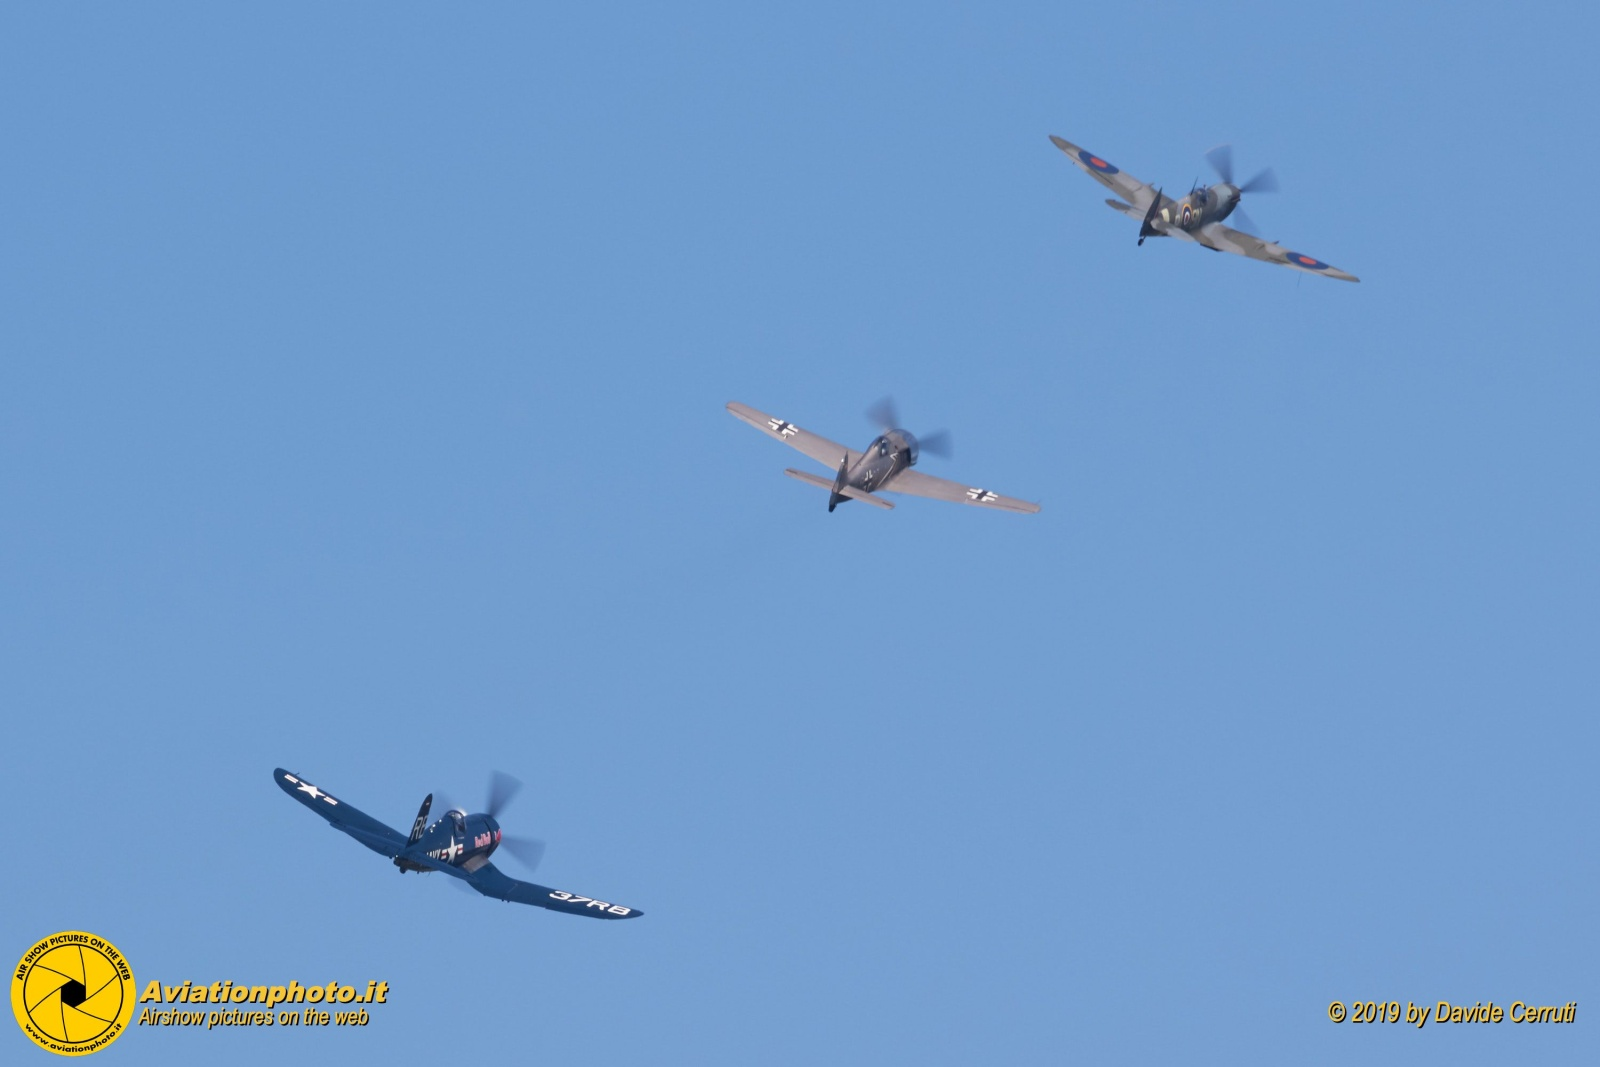 Airpower 19 - Zeltweg Air Base - Arrivals & Rehearsal